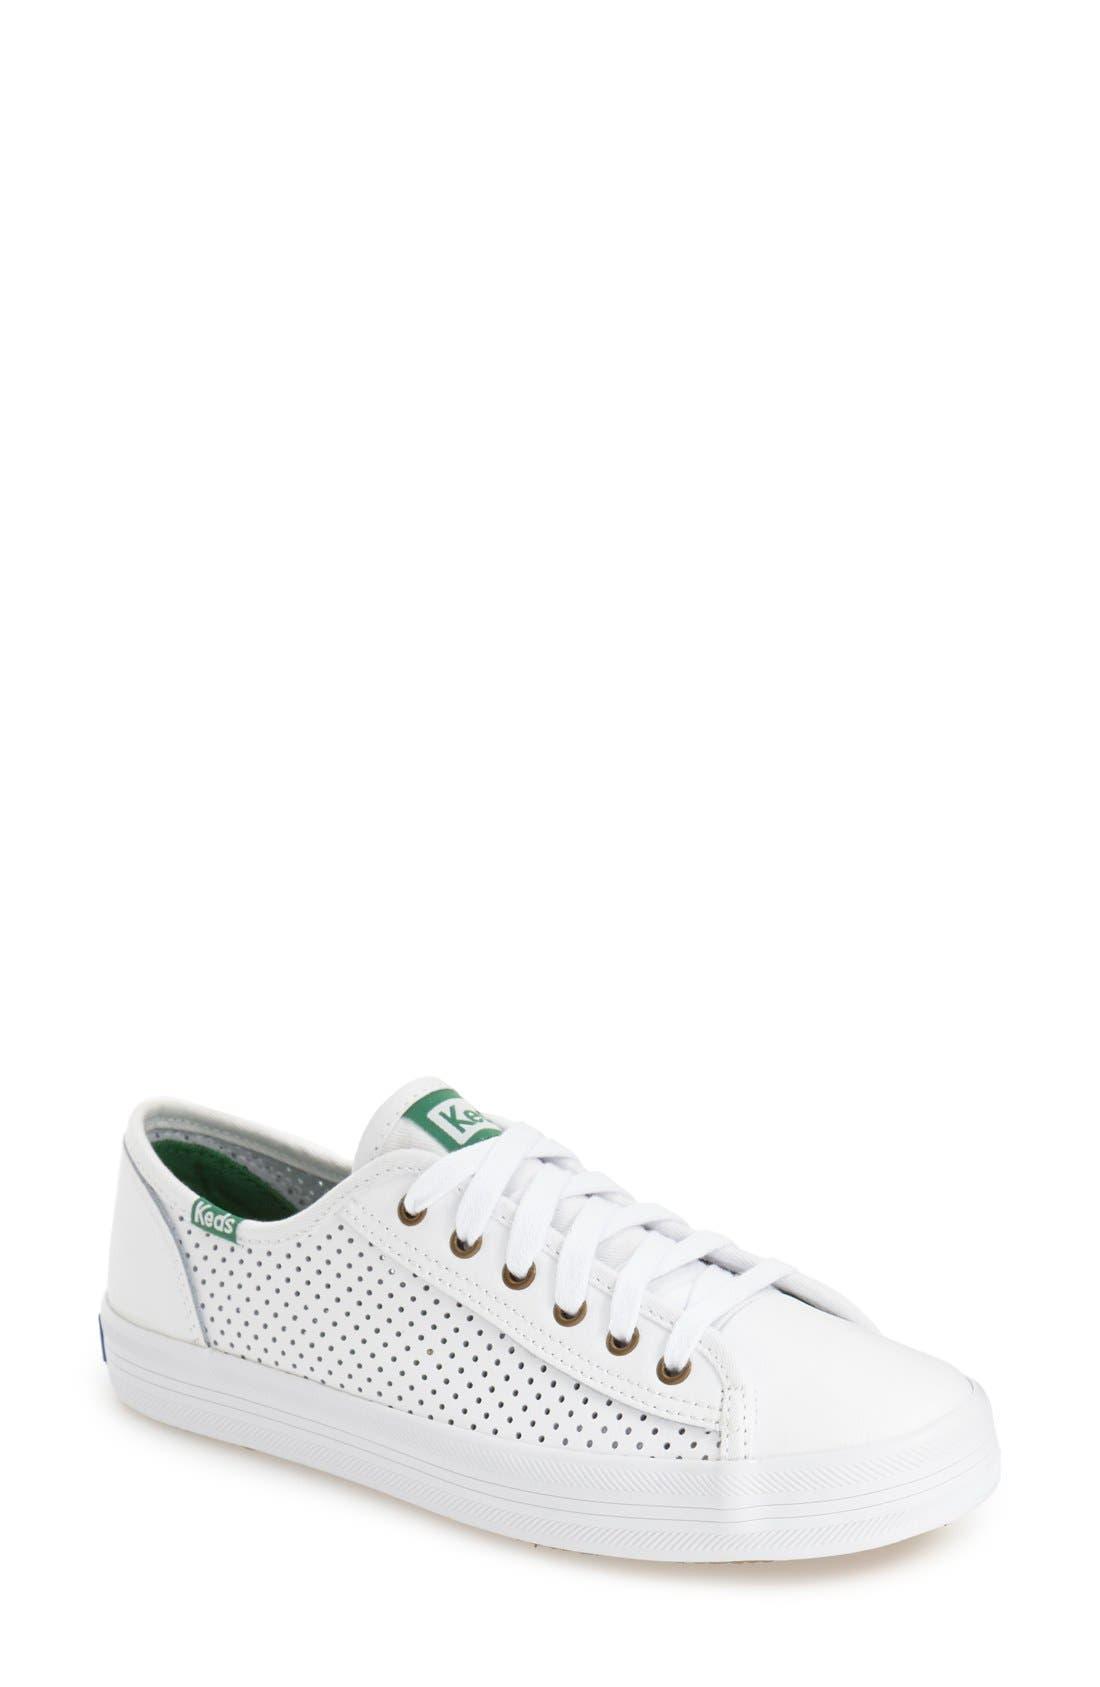 KEDS<SUP>®</SUP>,                             'Kickstart' Perforated Sneaker,                             Main thumbnail 1, color,                             100